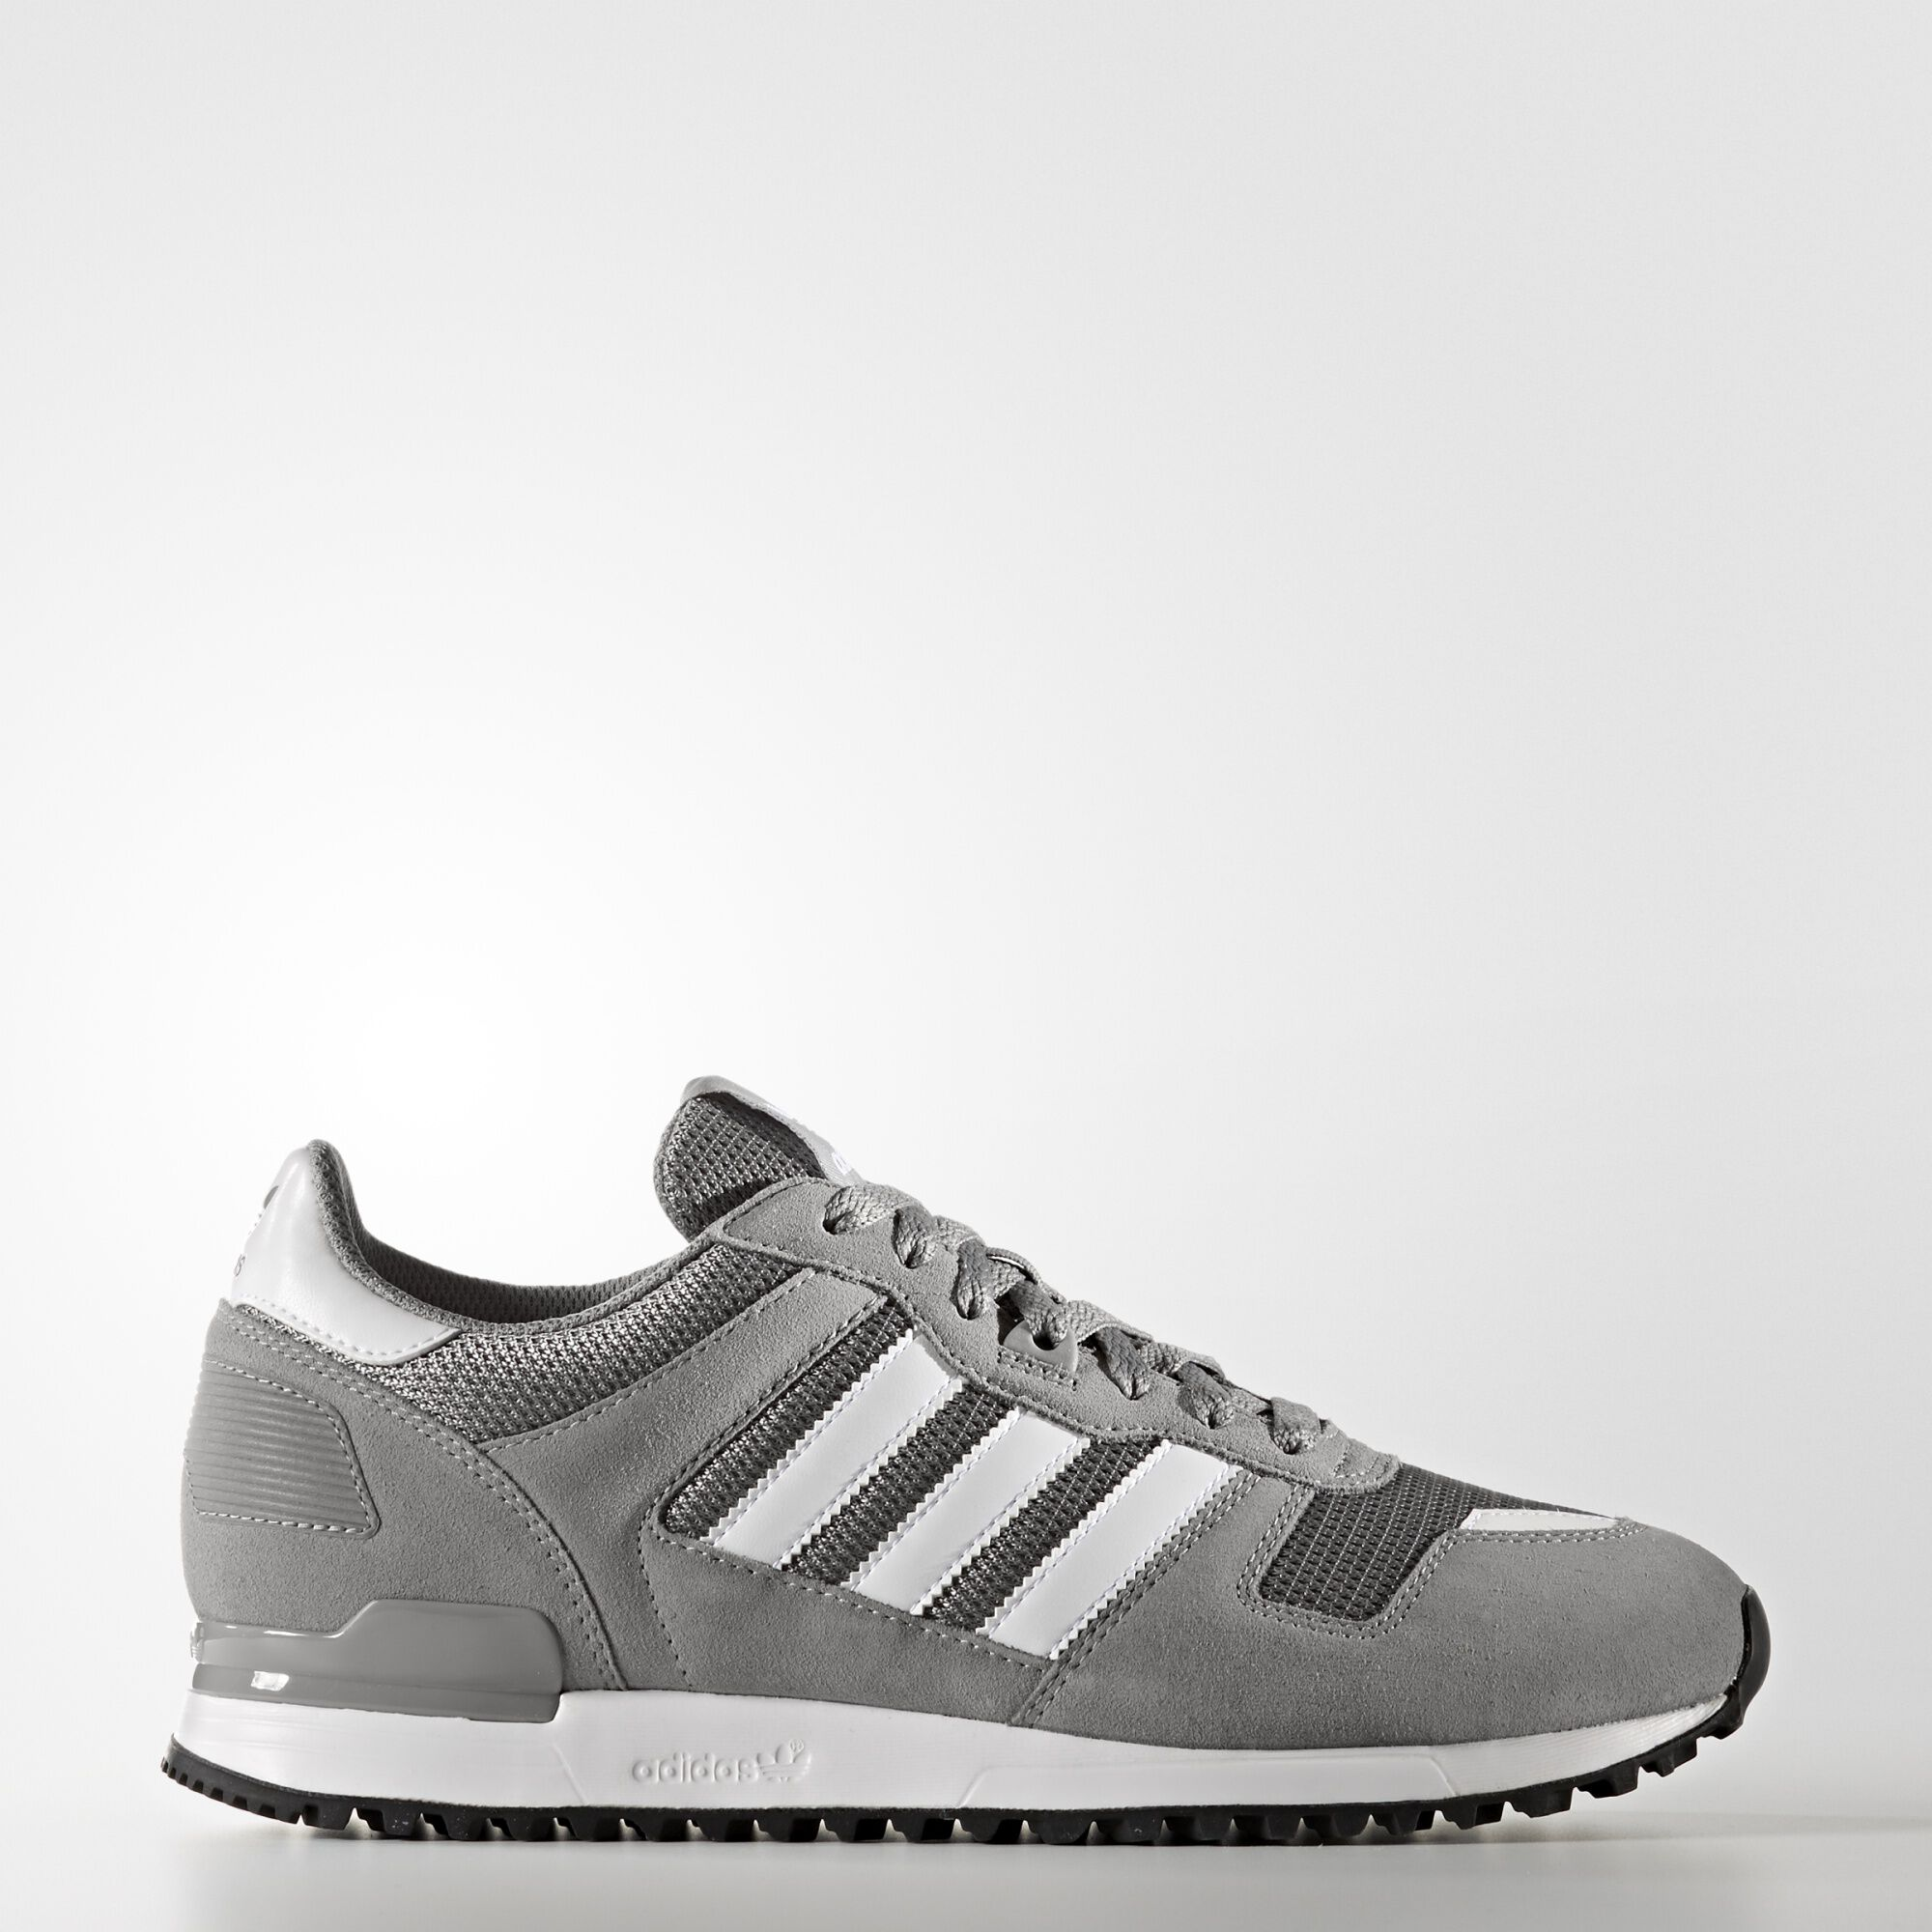 competitive price c46ec ef353 adidas zx 700 gris